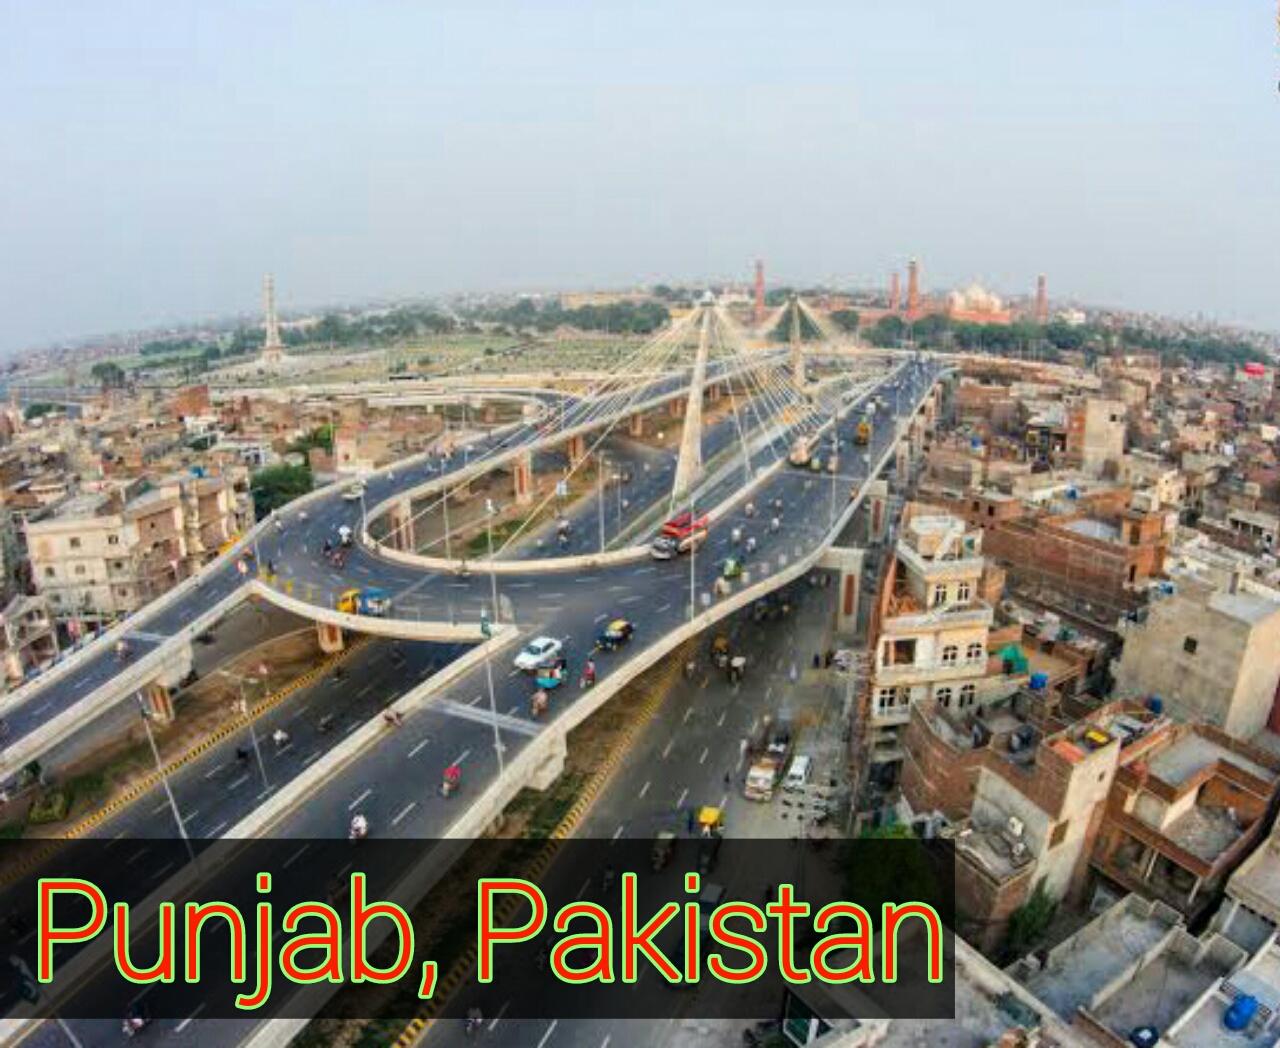 Punjab Province of Pakistan with Full Information | Pakistan Travels